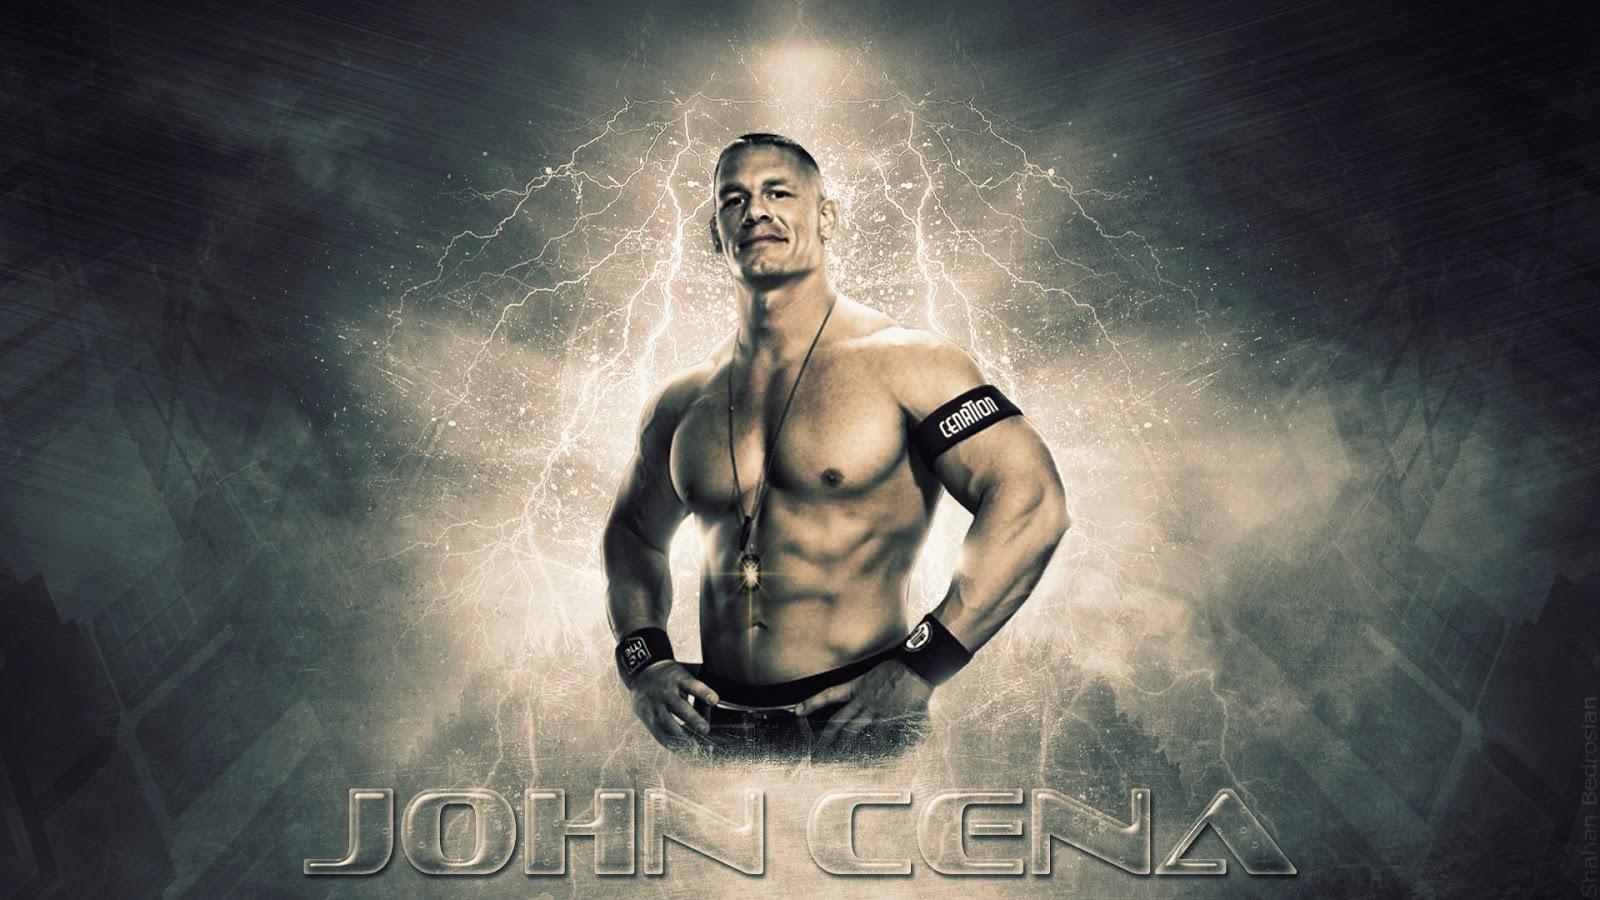 Most Popular WWE Star John Cena Wallpaper in HD